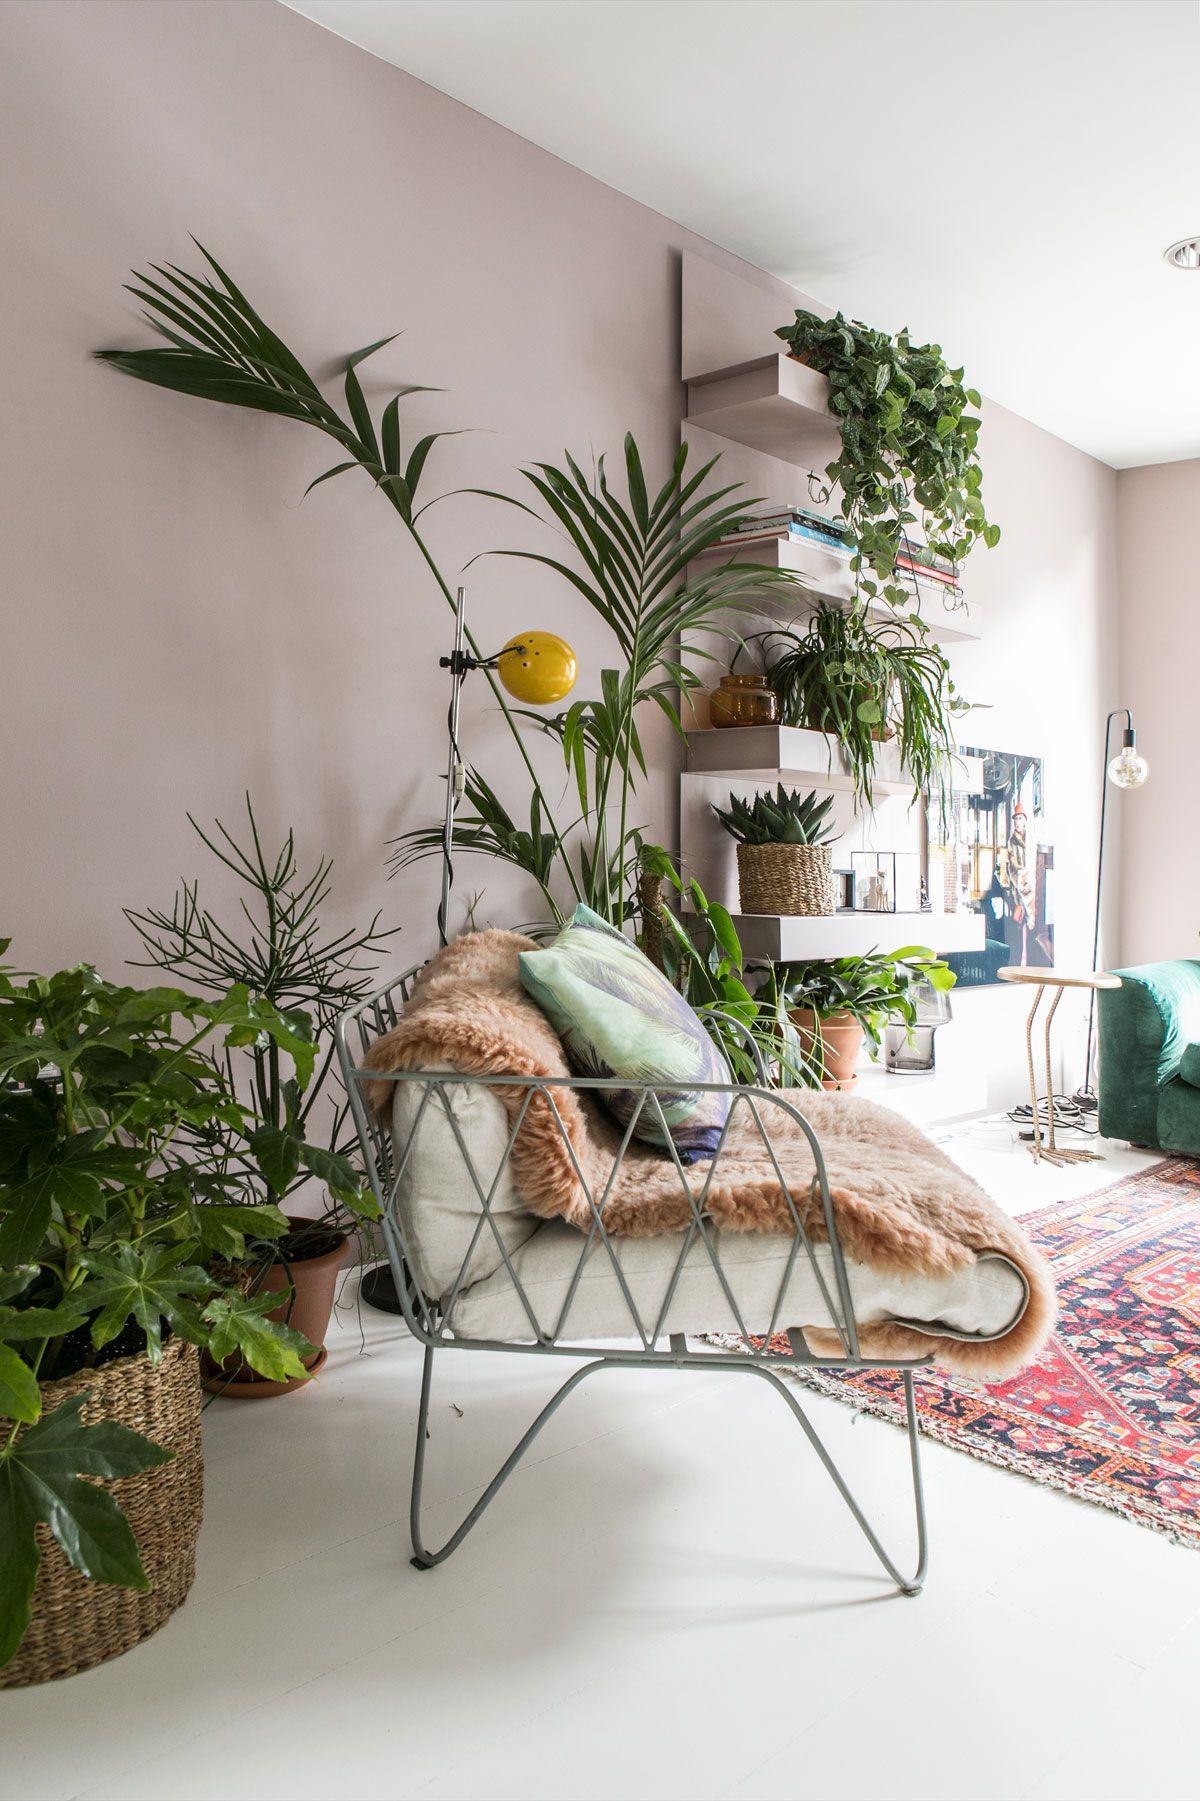 Bohemian jaren vijftig én botanische interieur van daantje take a look at this danisch bohemian fifties and botanic interior vtwonen 04 2018